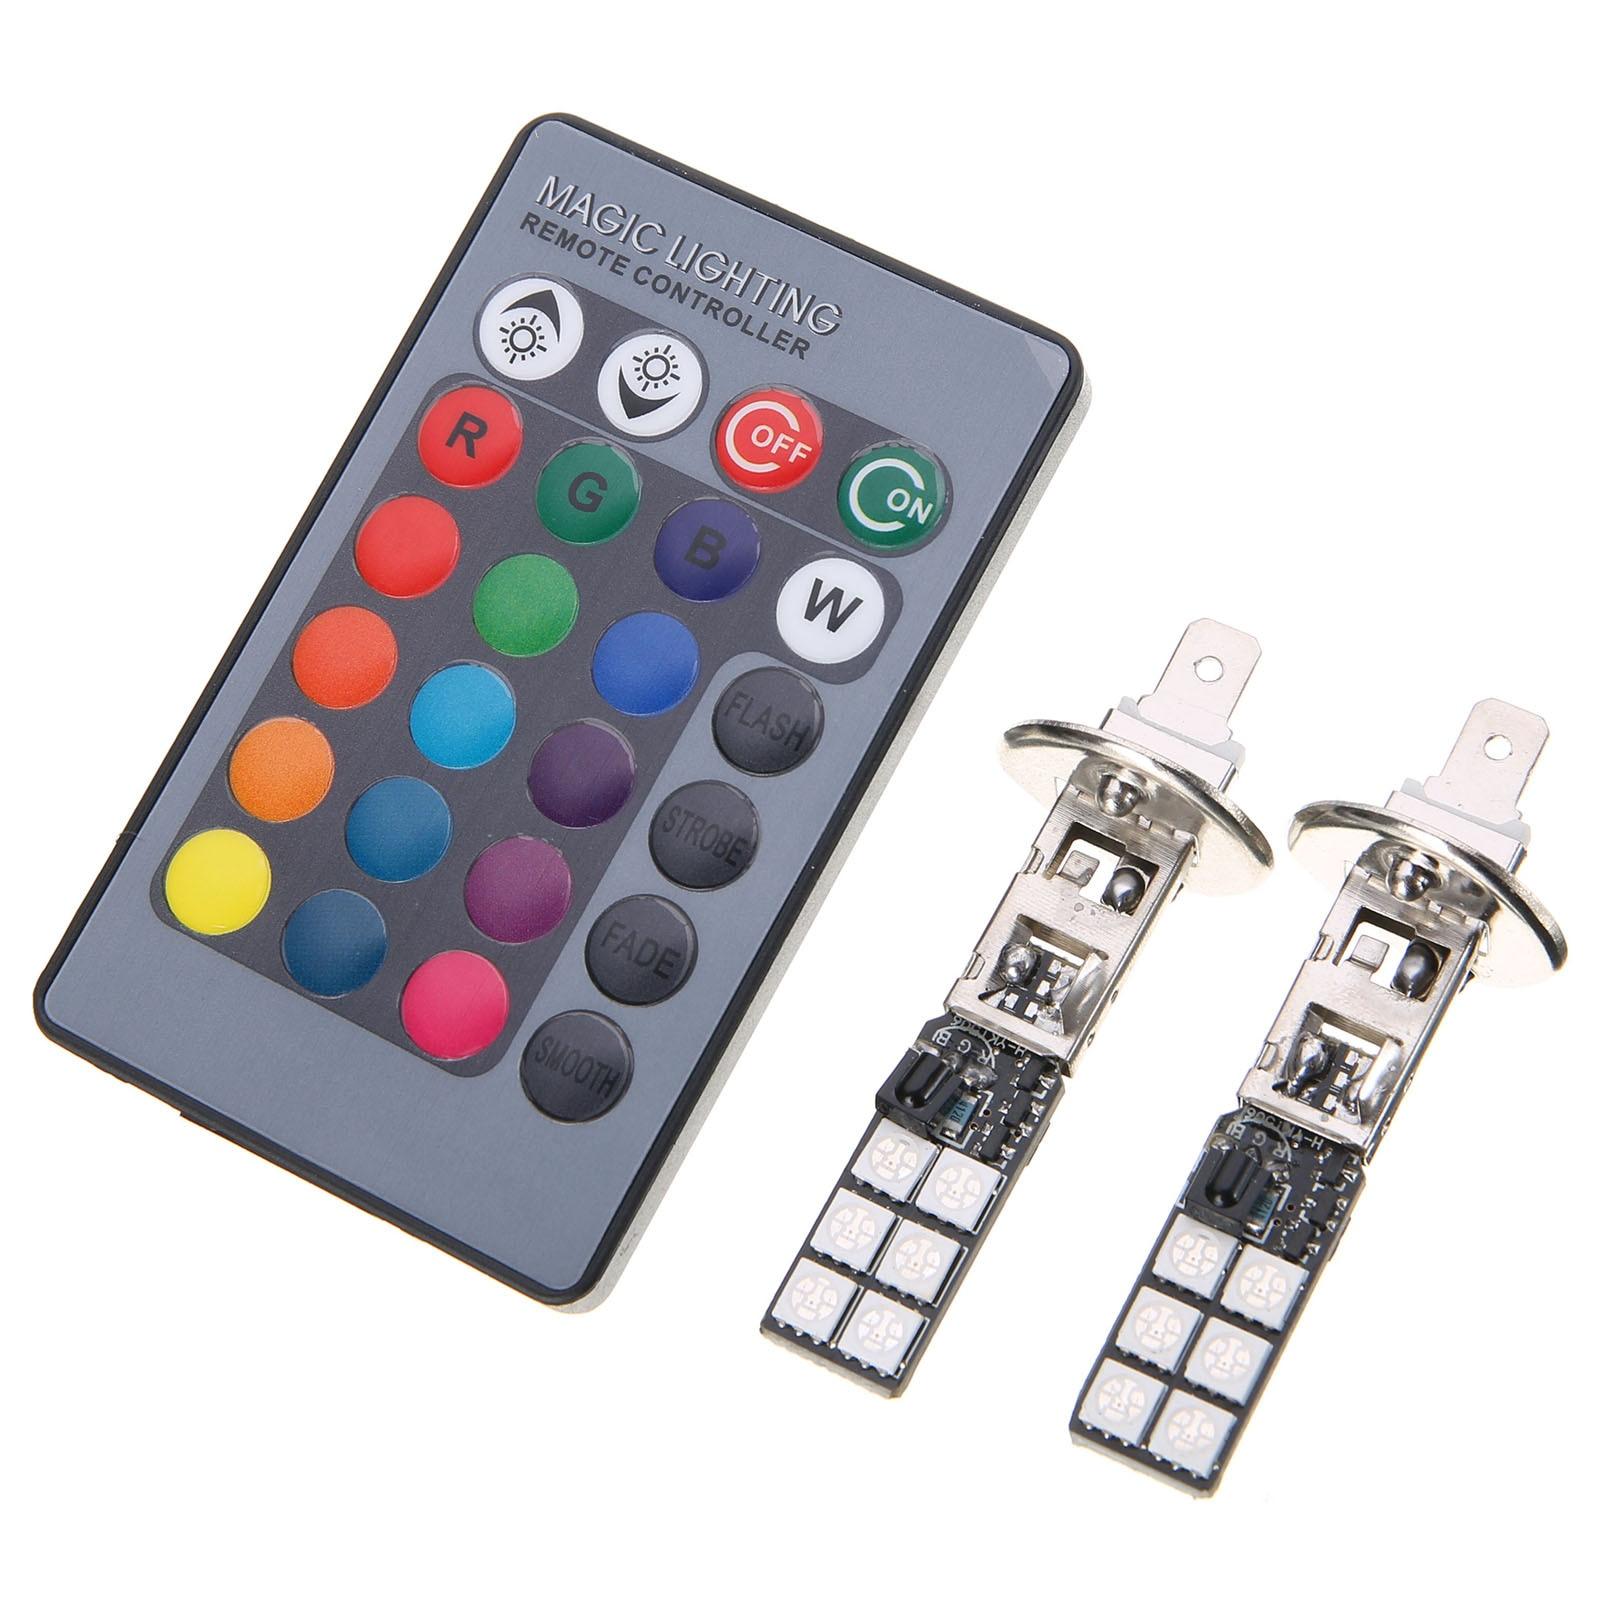 2PCS Colorful RGB H1 LED Fog Light 5050 12SMD LED Car DRL Driving Light Tail Turn SignalBrake Lamp + Wireless Remote Control